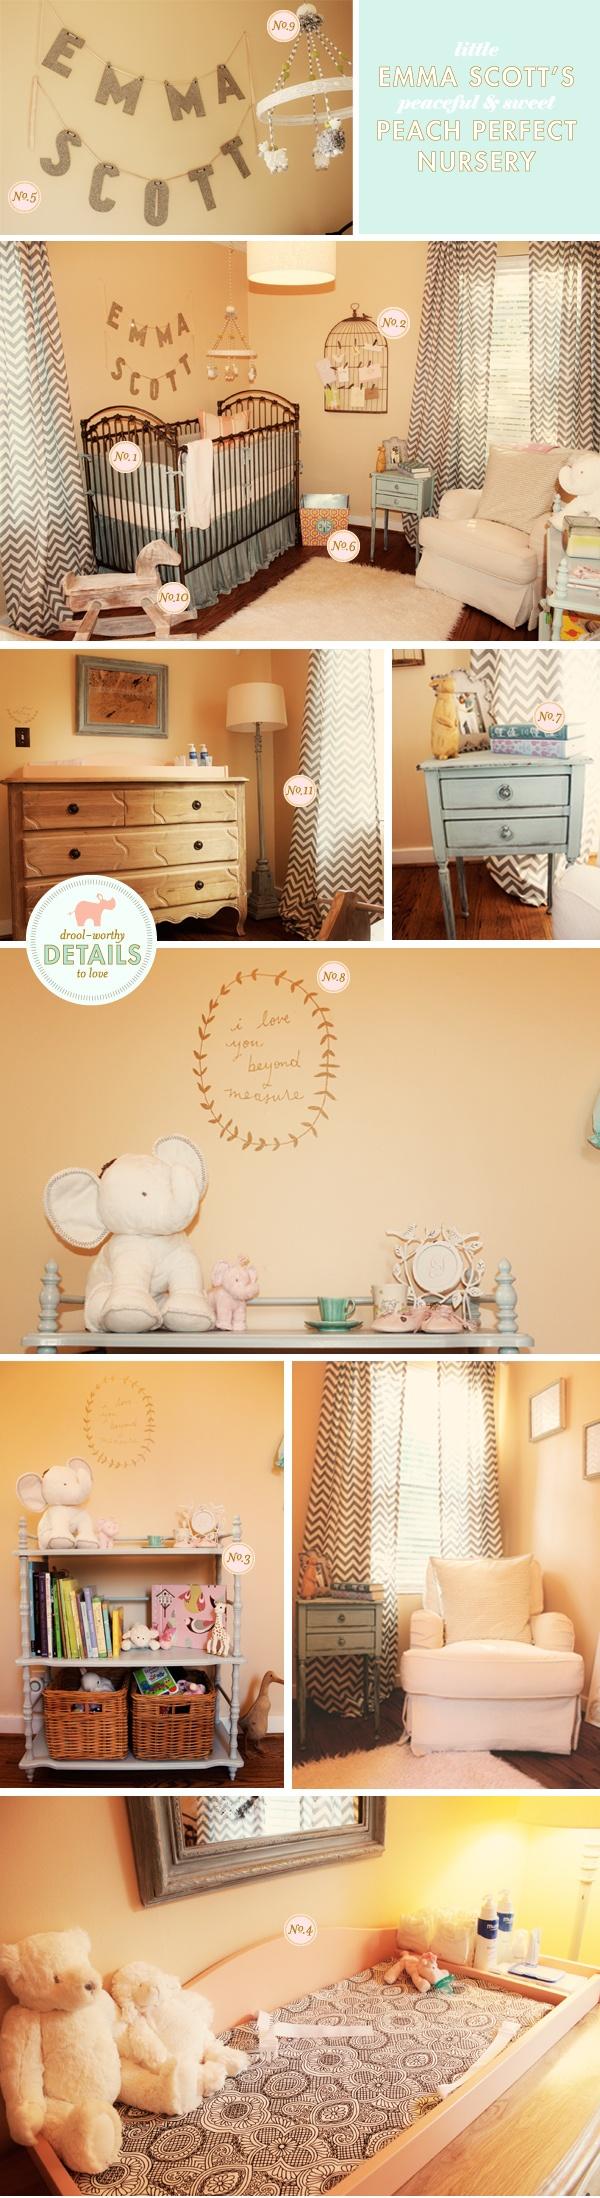 Great nursery ideas | • NURSERY • | Pinterest | Nursery, Baby baby ...